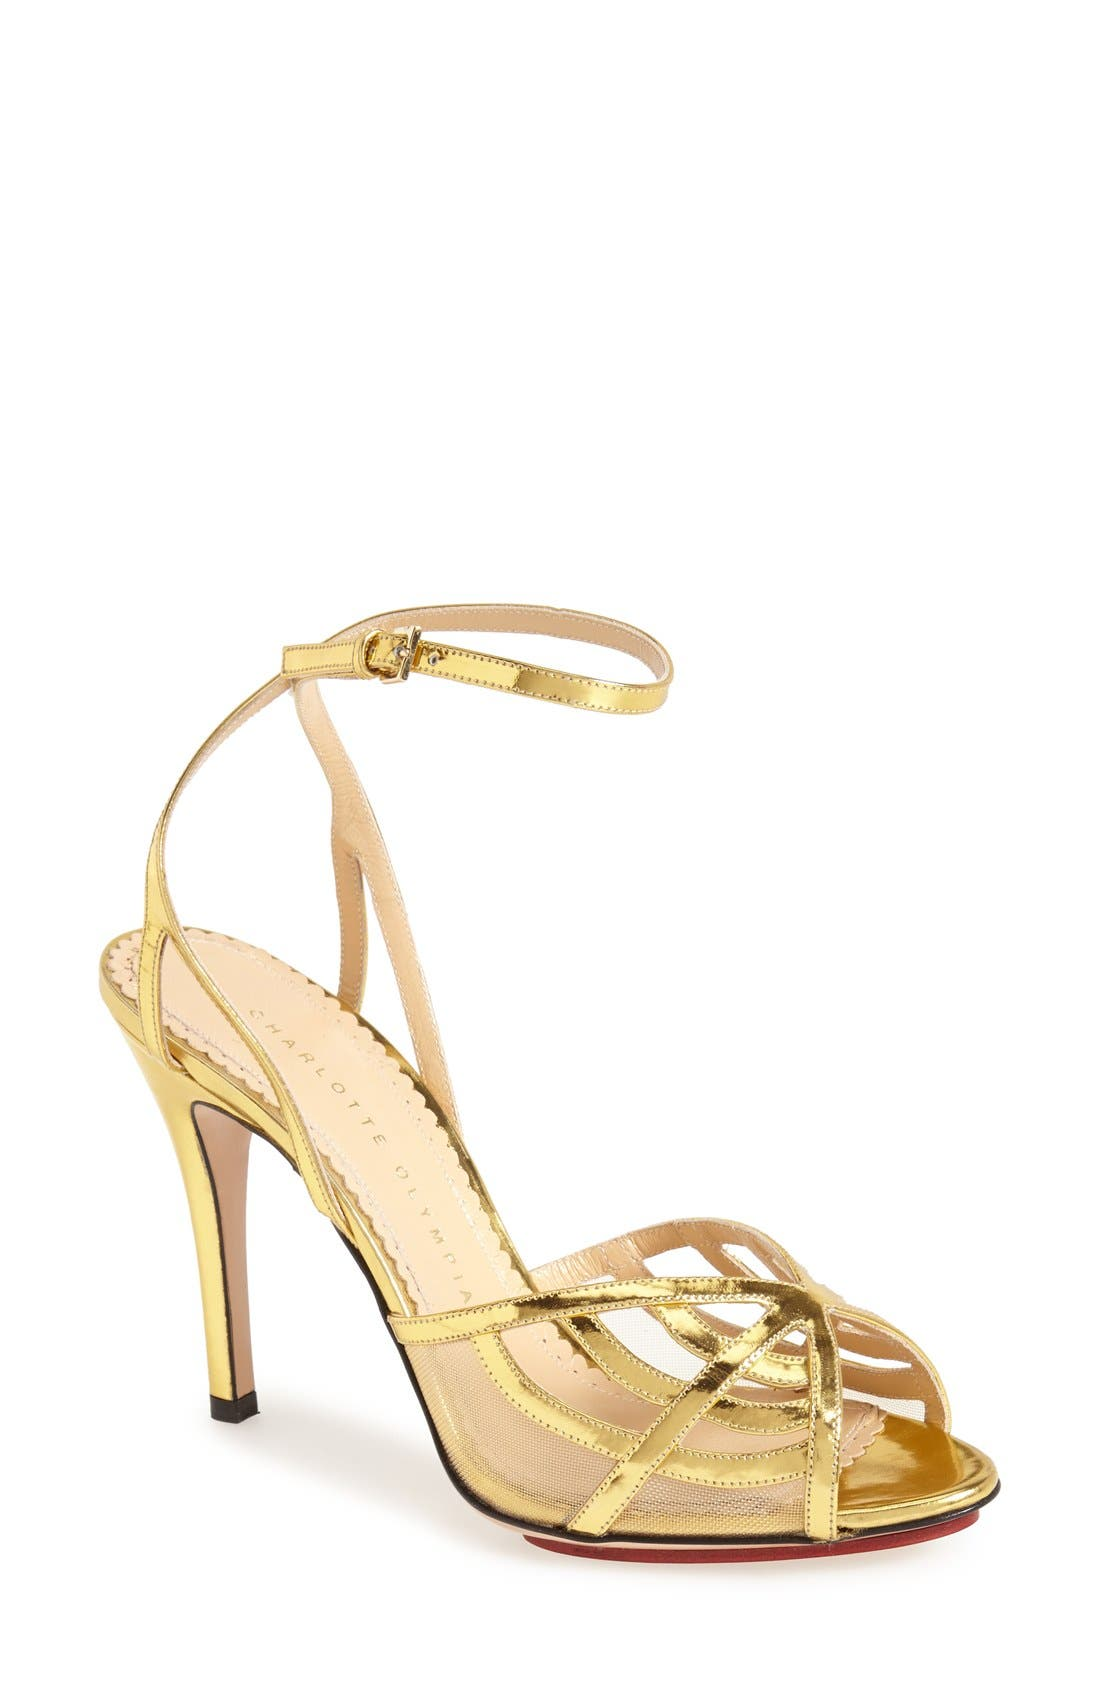 Main Image - Charlotte Olympia 'Octavia' Platform Sandal (Women)